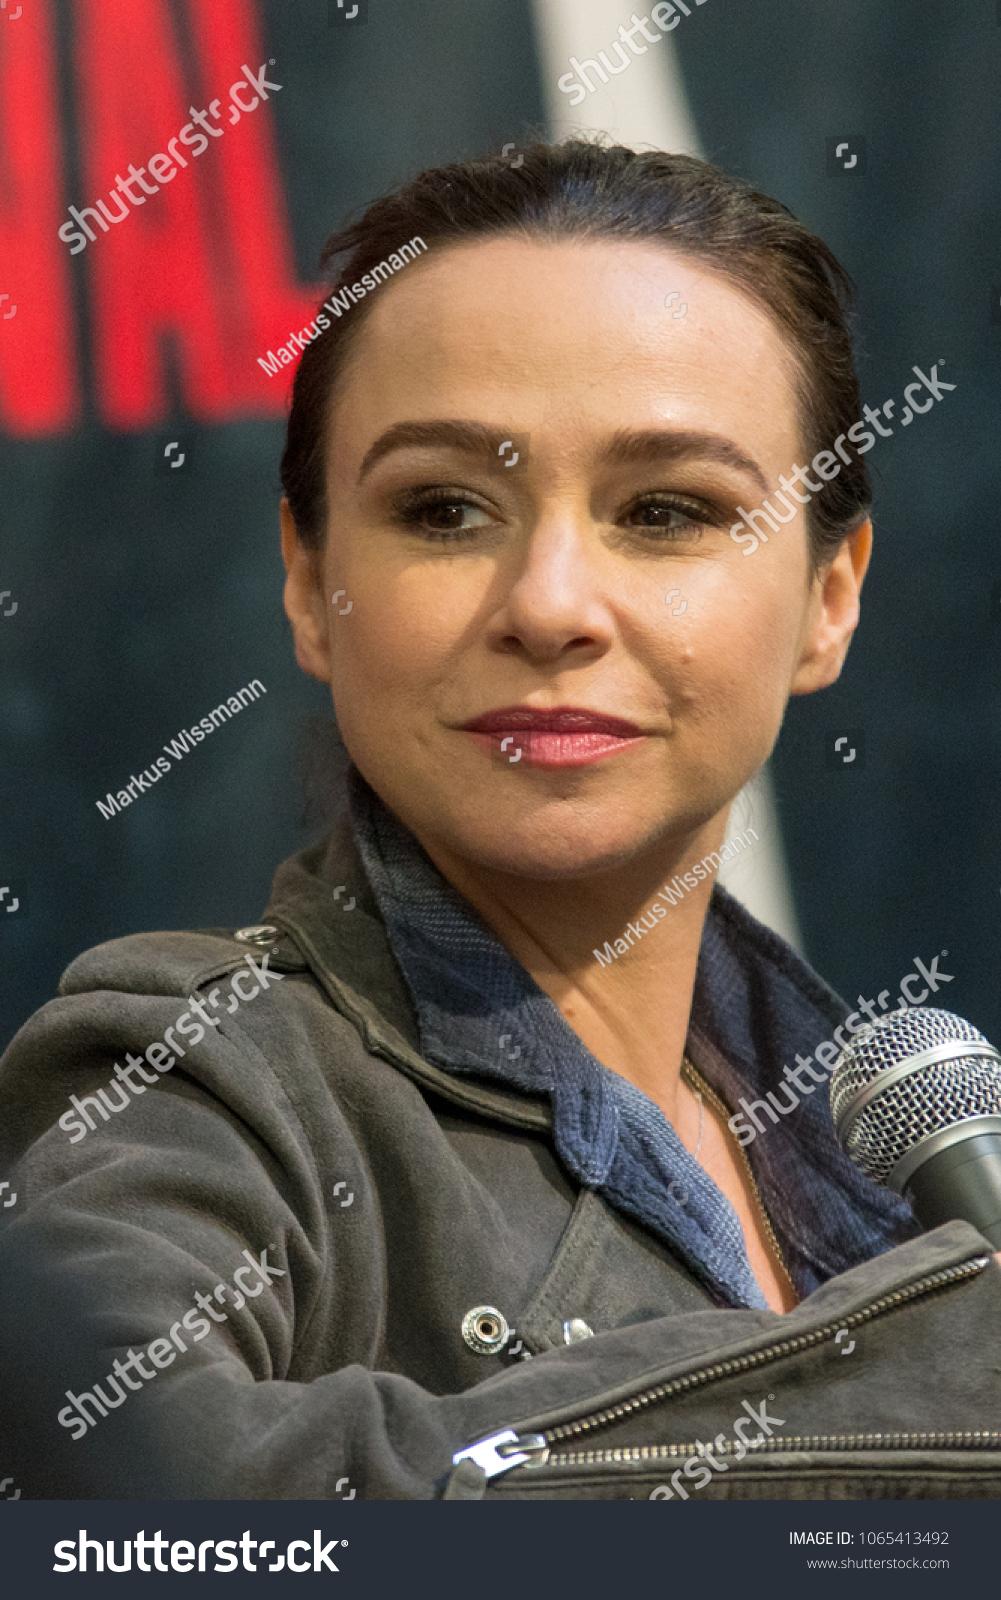 dortmund germany april 8 actress danielle stock photo (edit now